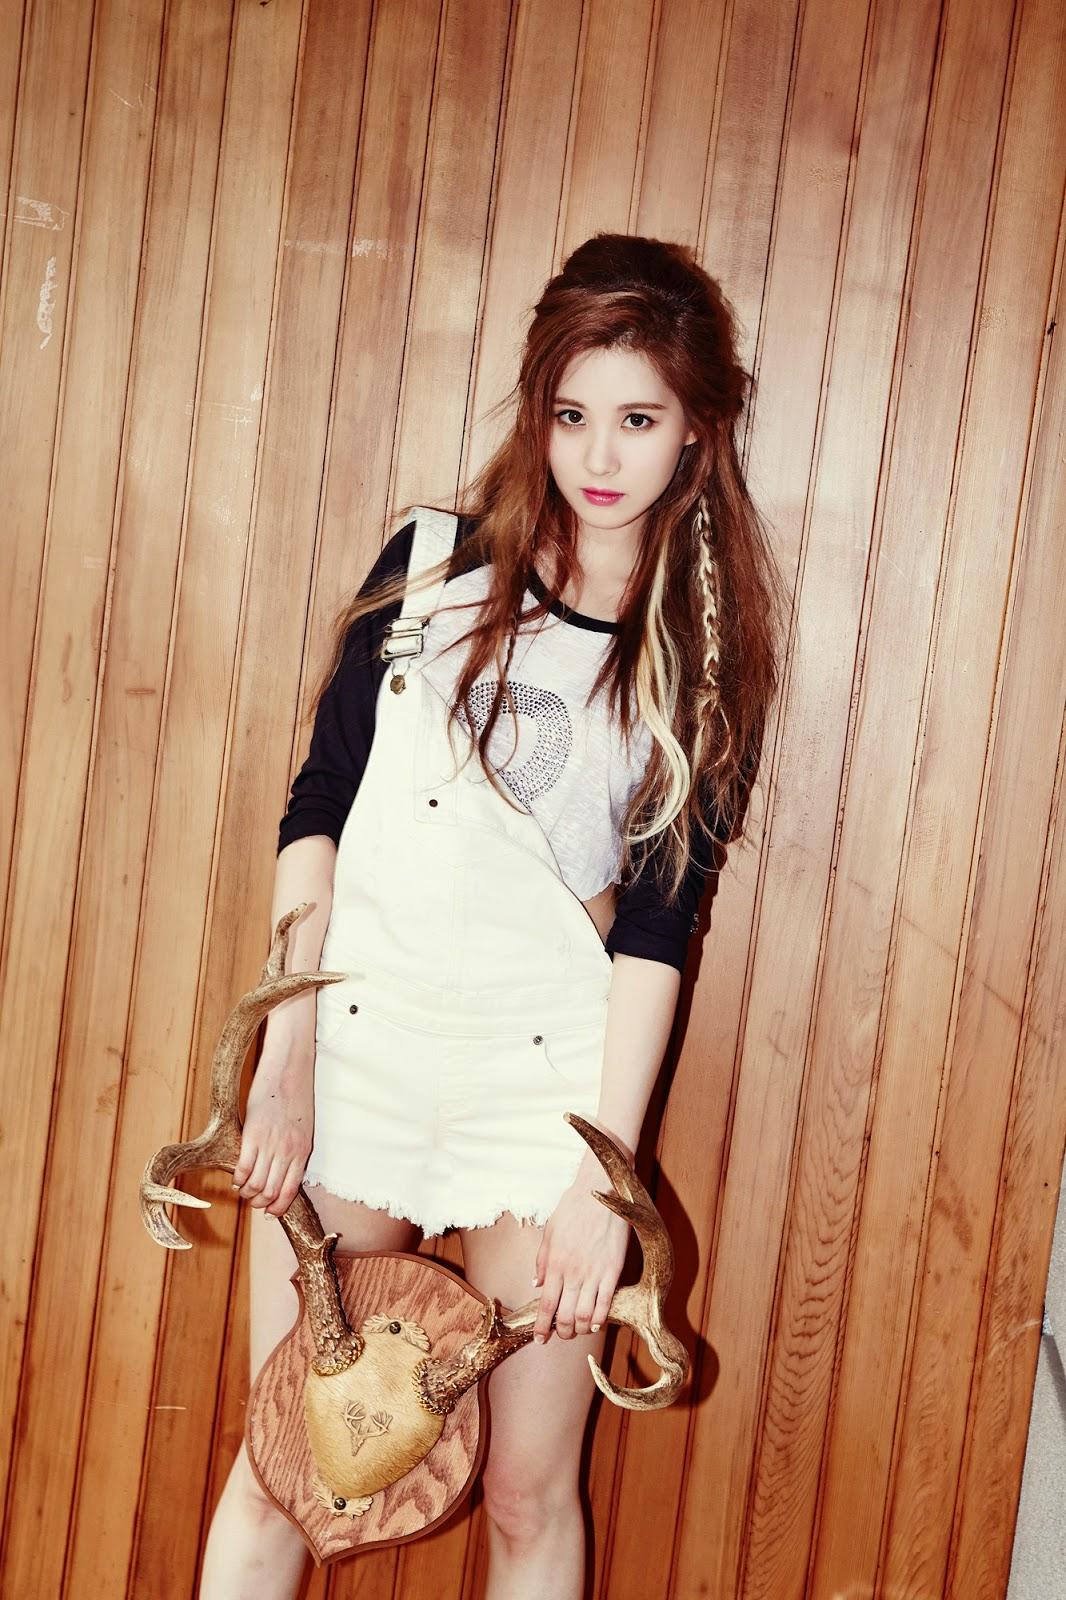 Snsd Seohyun Airport Fashion: [Pictures] 140913 SNSD Seohyun